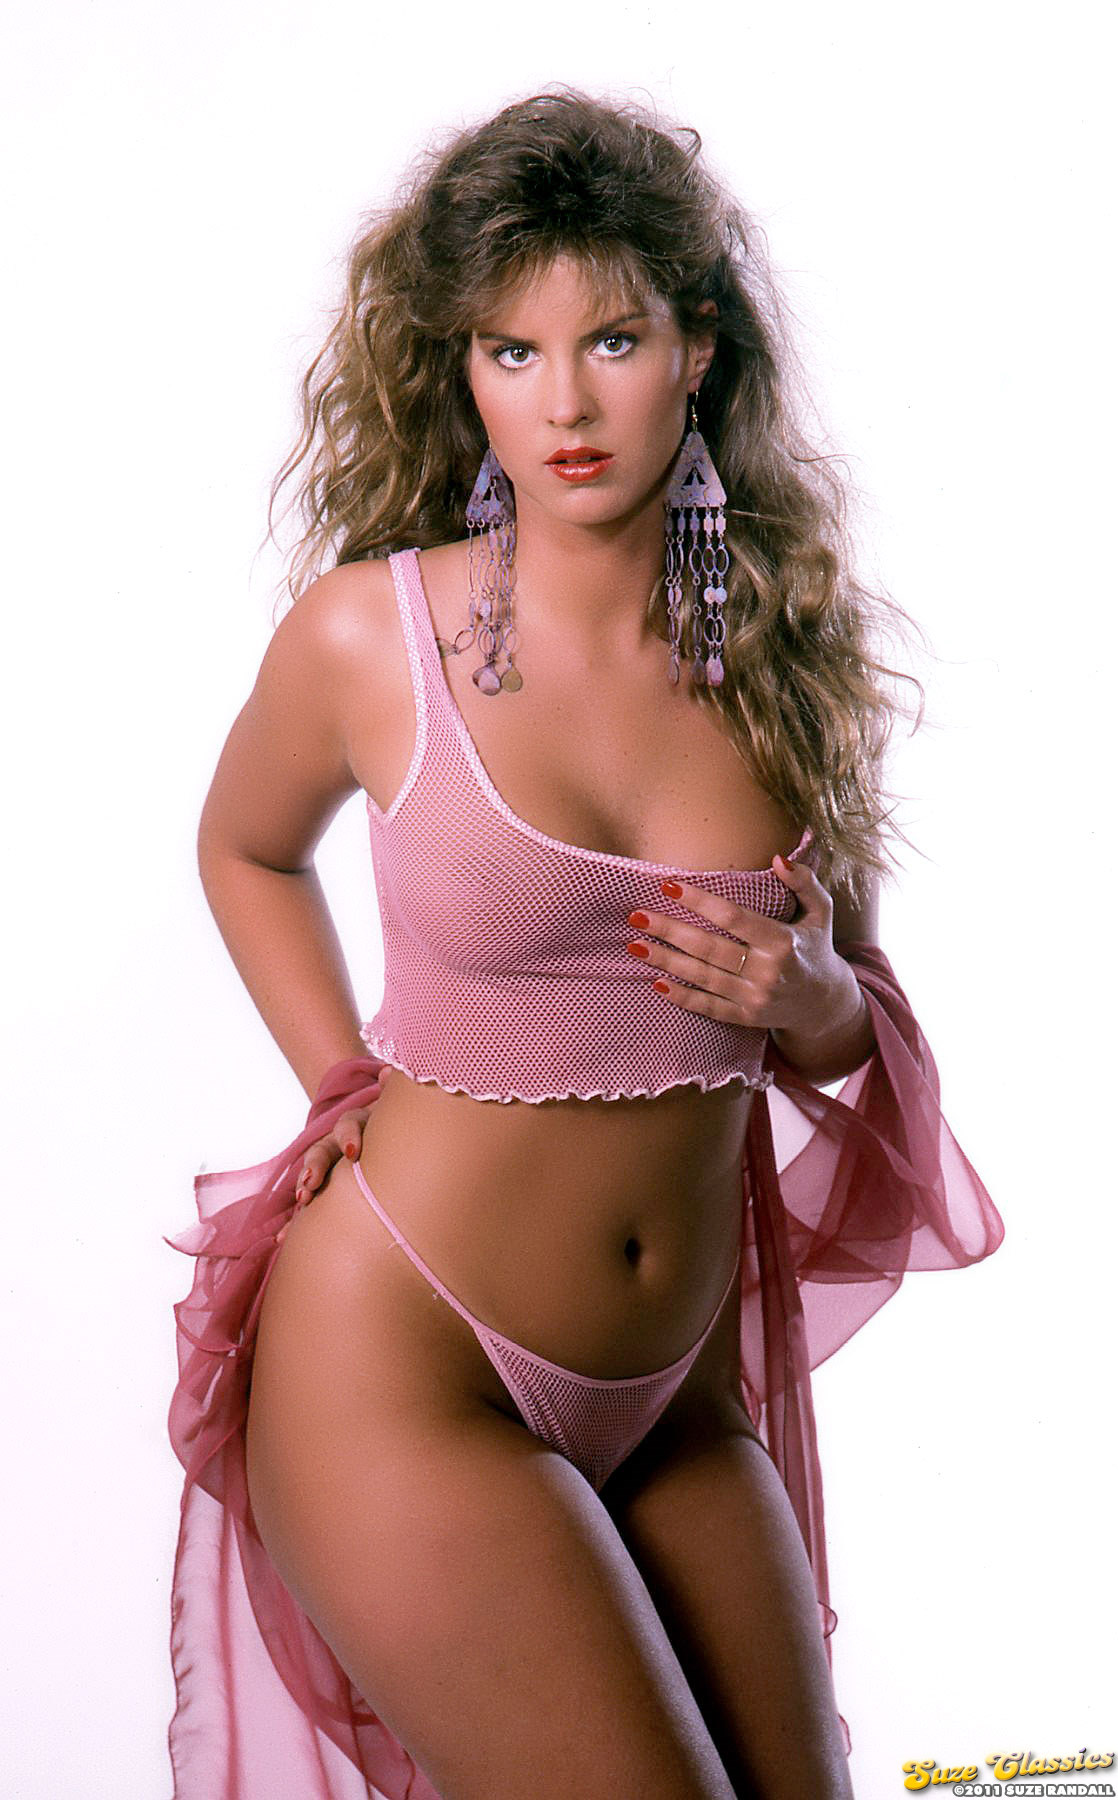 Actrices Porno Maduras Top actriz porno retirada p.j. sparxx | fotos porno xxx | chicas